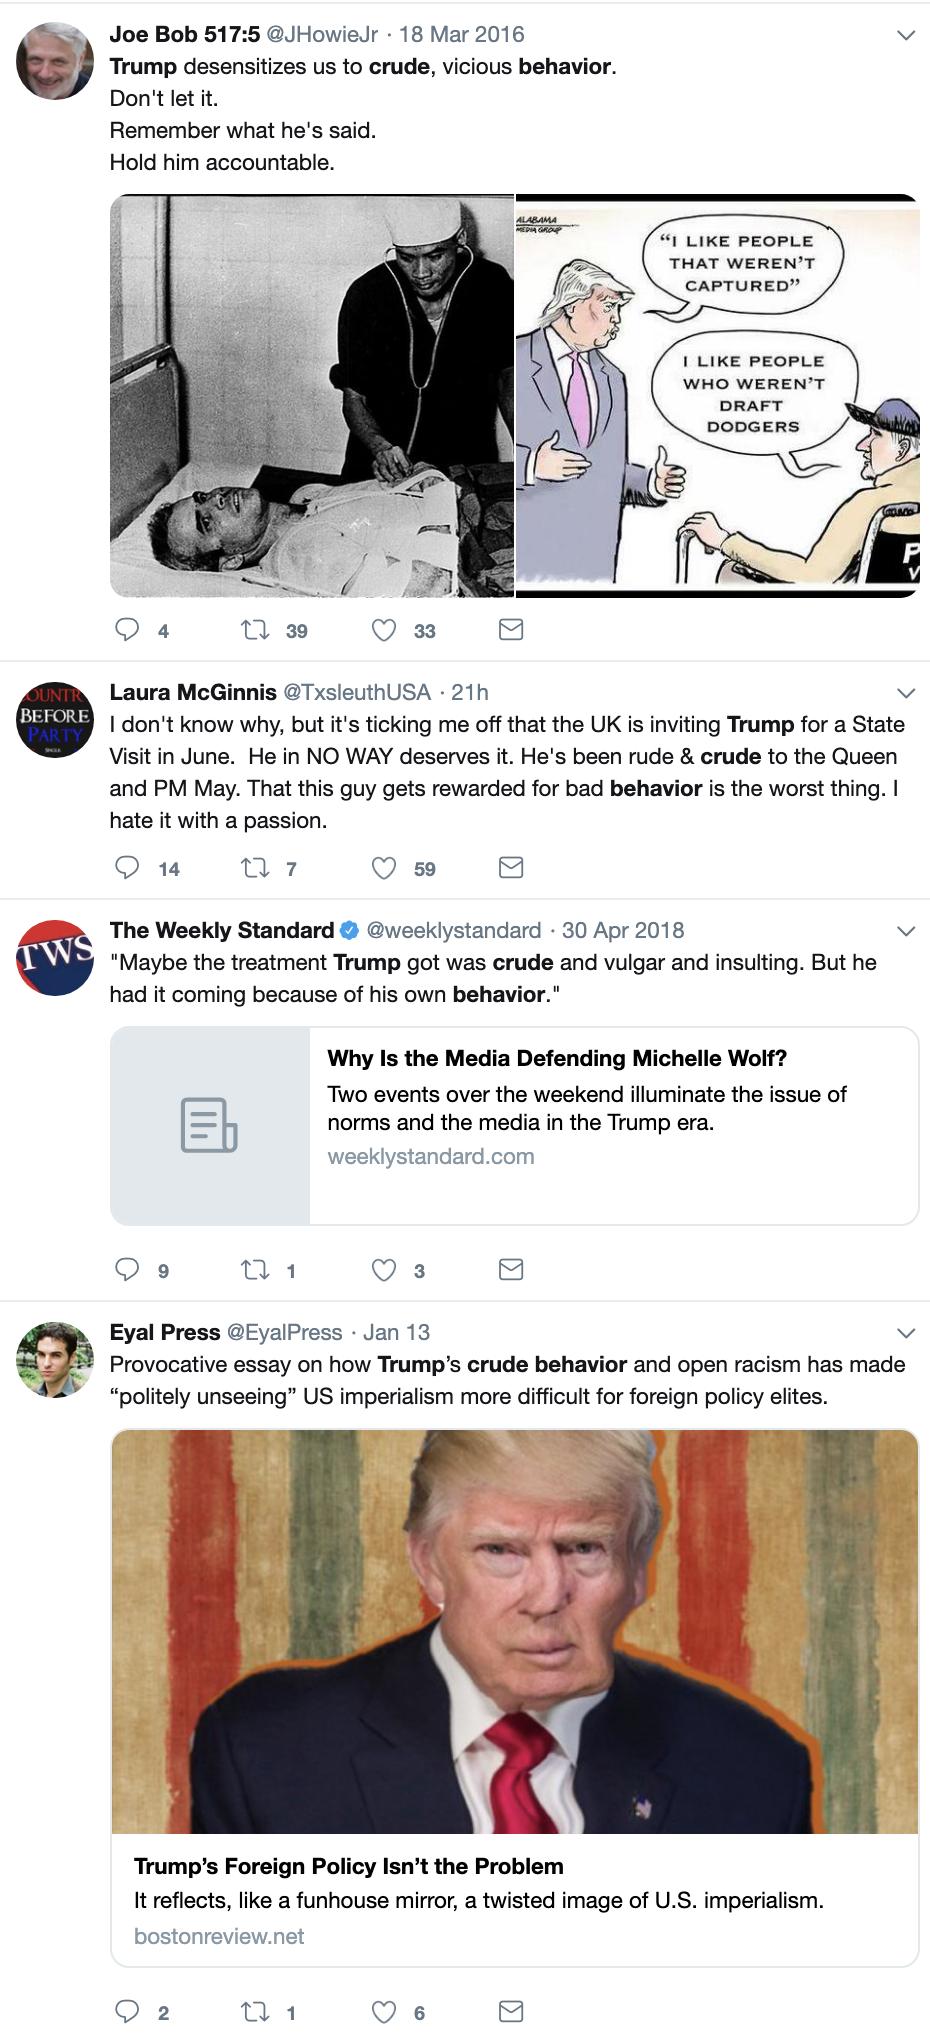 Screen-Shot-2019-04-24-at-9.22.36-AM GOP 'Hero' Defects & Joins Democrats To Spite Donald Trump Corruption Crime Domestic Policy Donald Trump Politics Top Stories